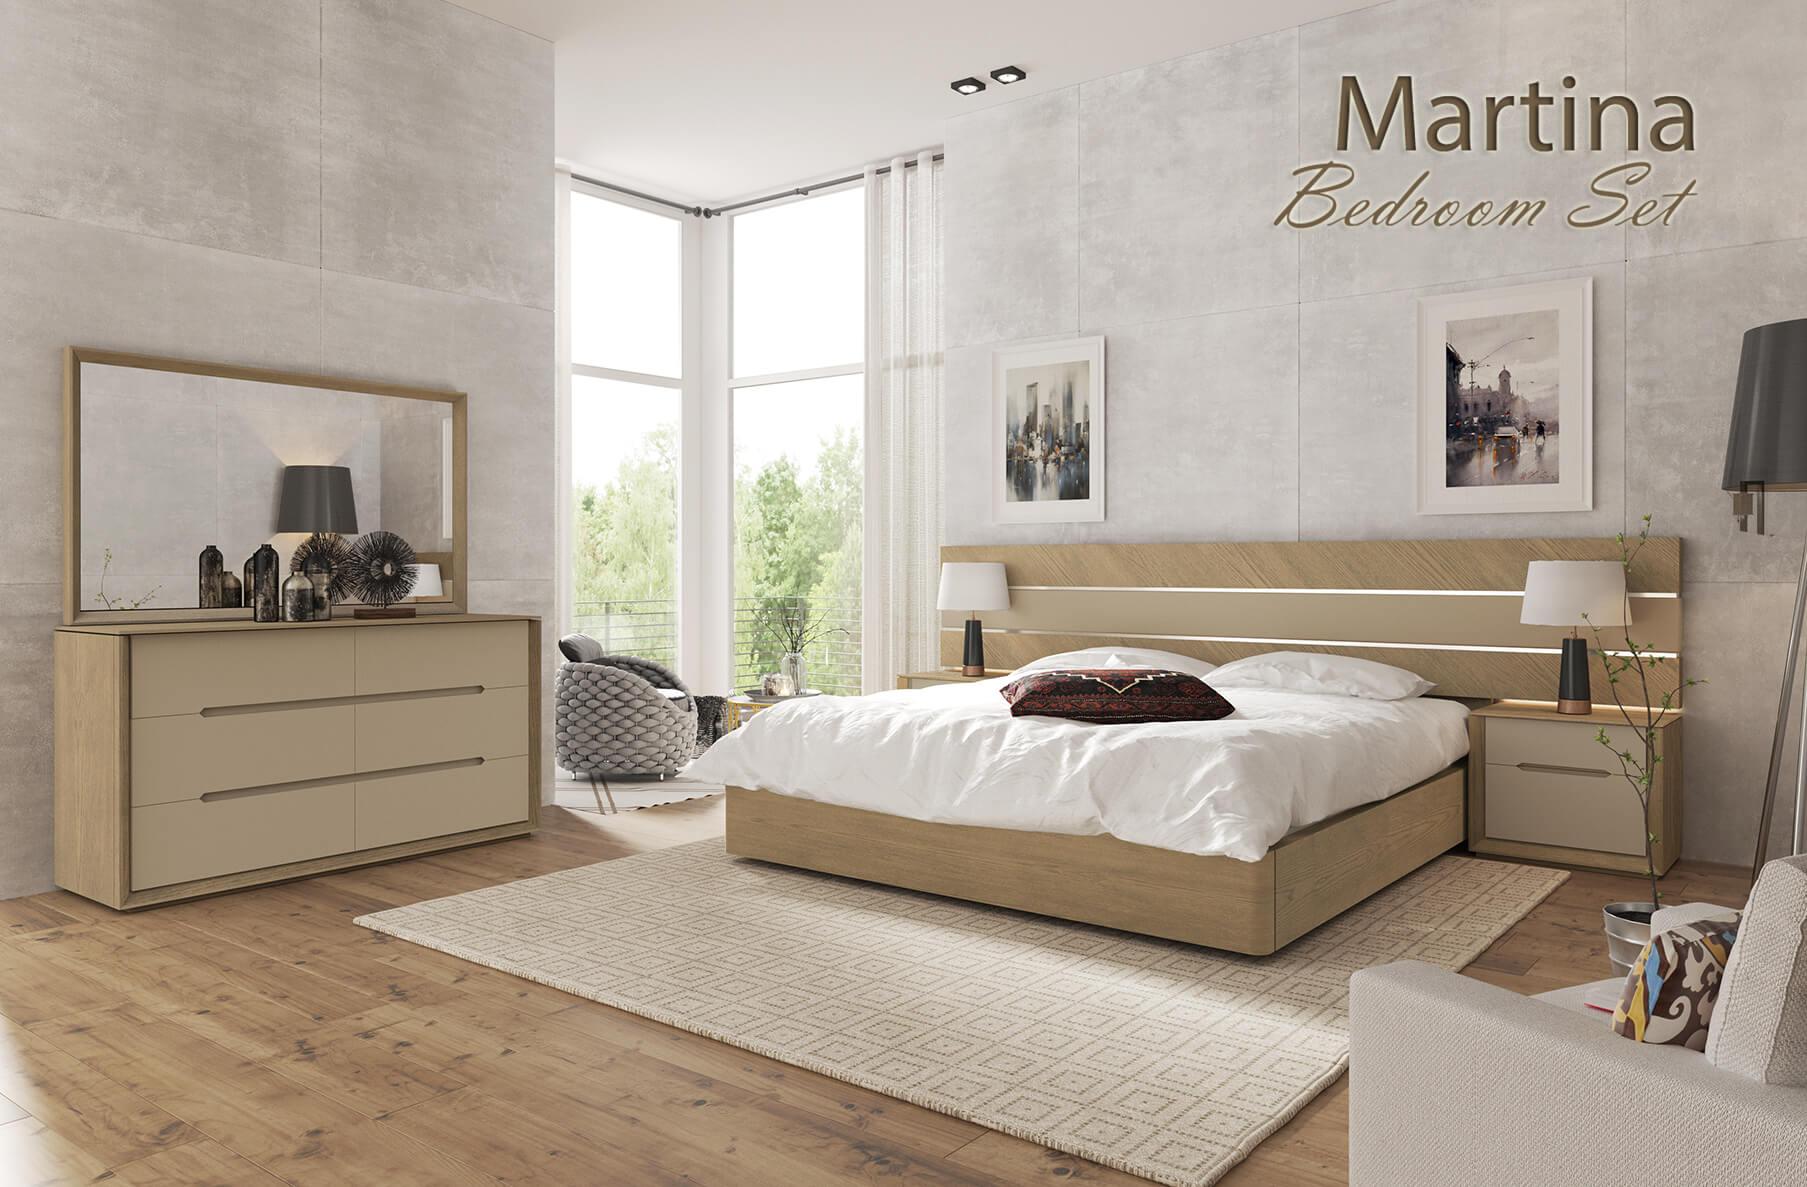 Martina Bedroom, Cheap